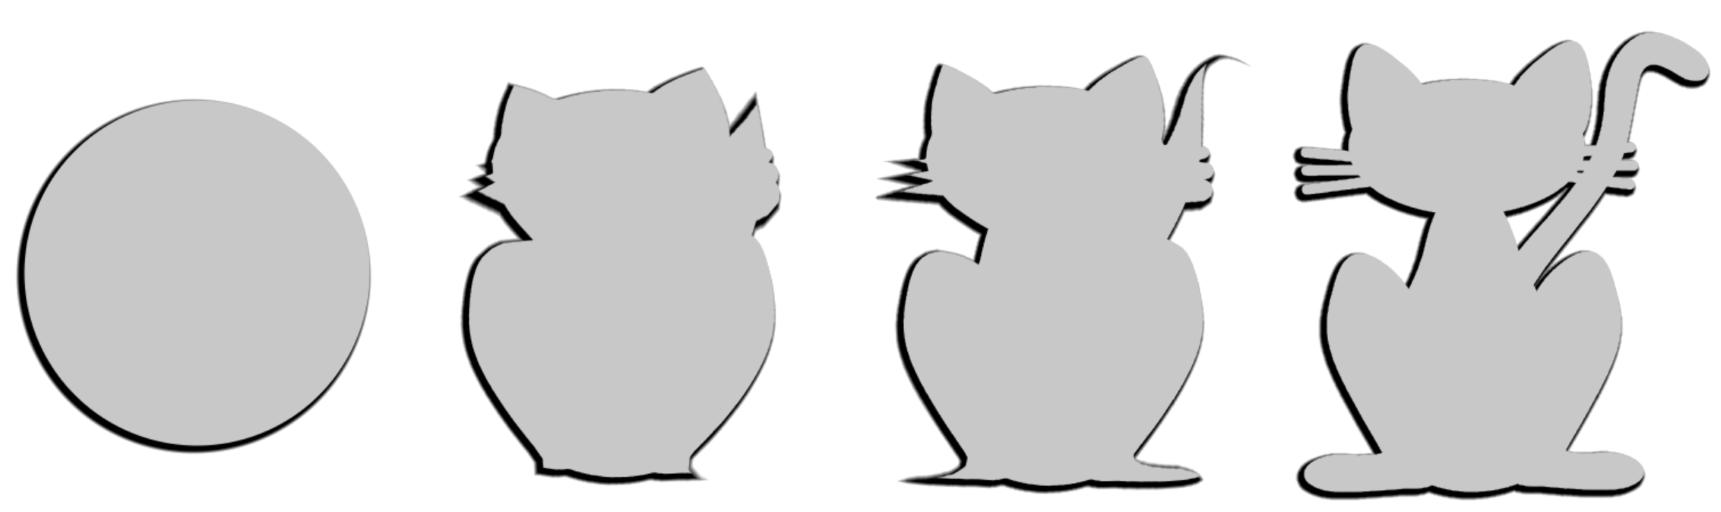 morphcats